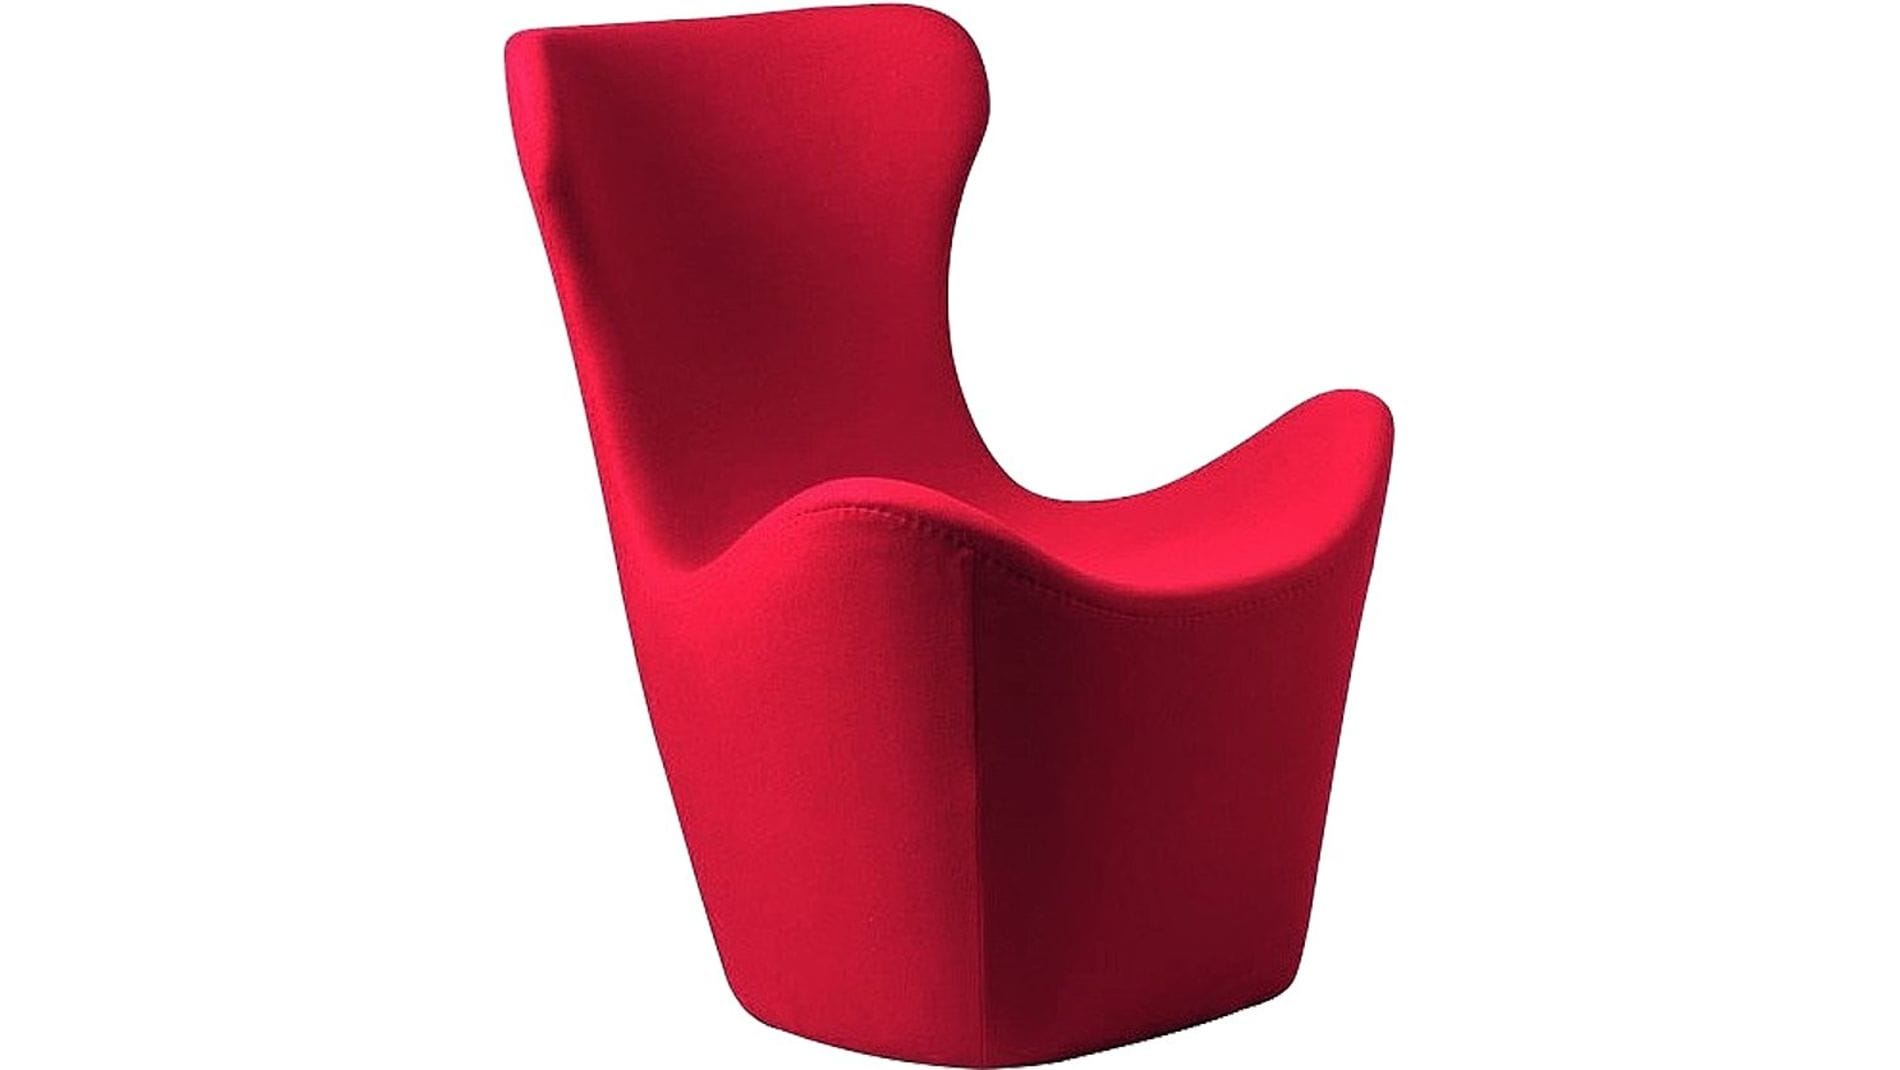 Кресло Papilio Lounge Chair Красное Кашемир М